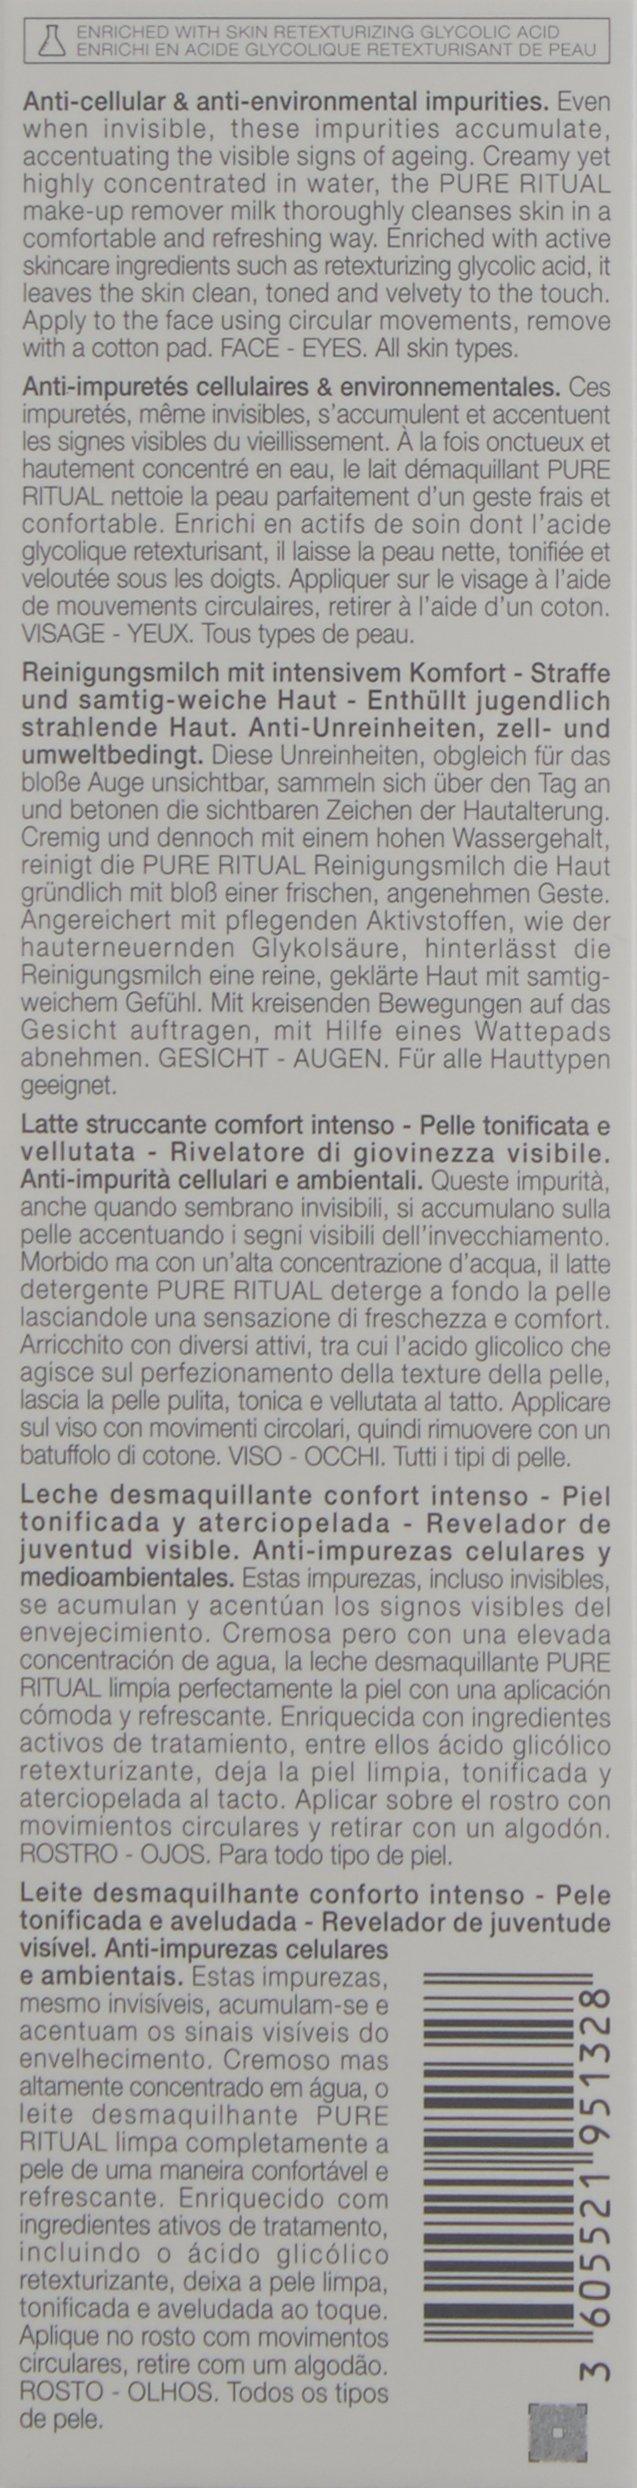 Helena Rubinstein Pure Ritual Intense Comfort Make-Up Remover Milk, 6.76 Ounce by Helena Rubinstein (Image #4)